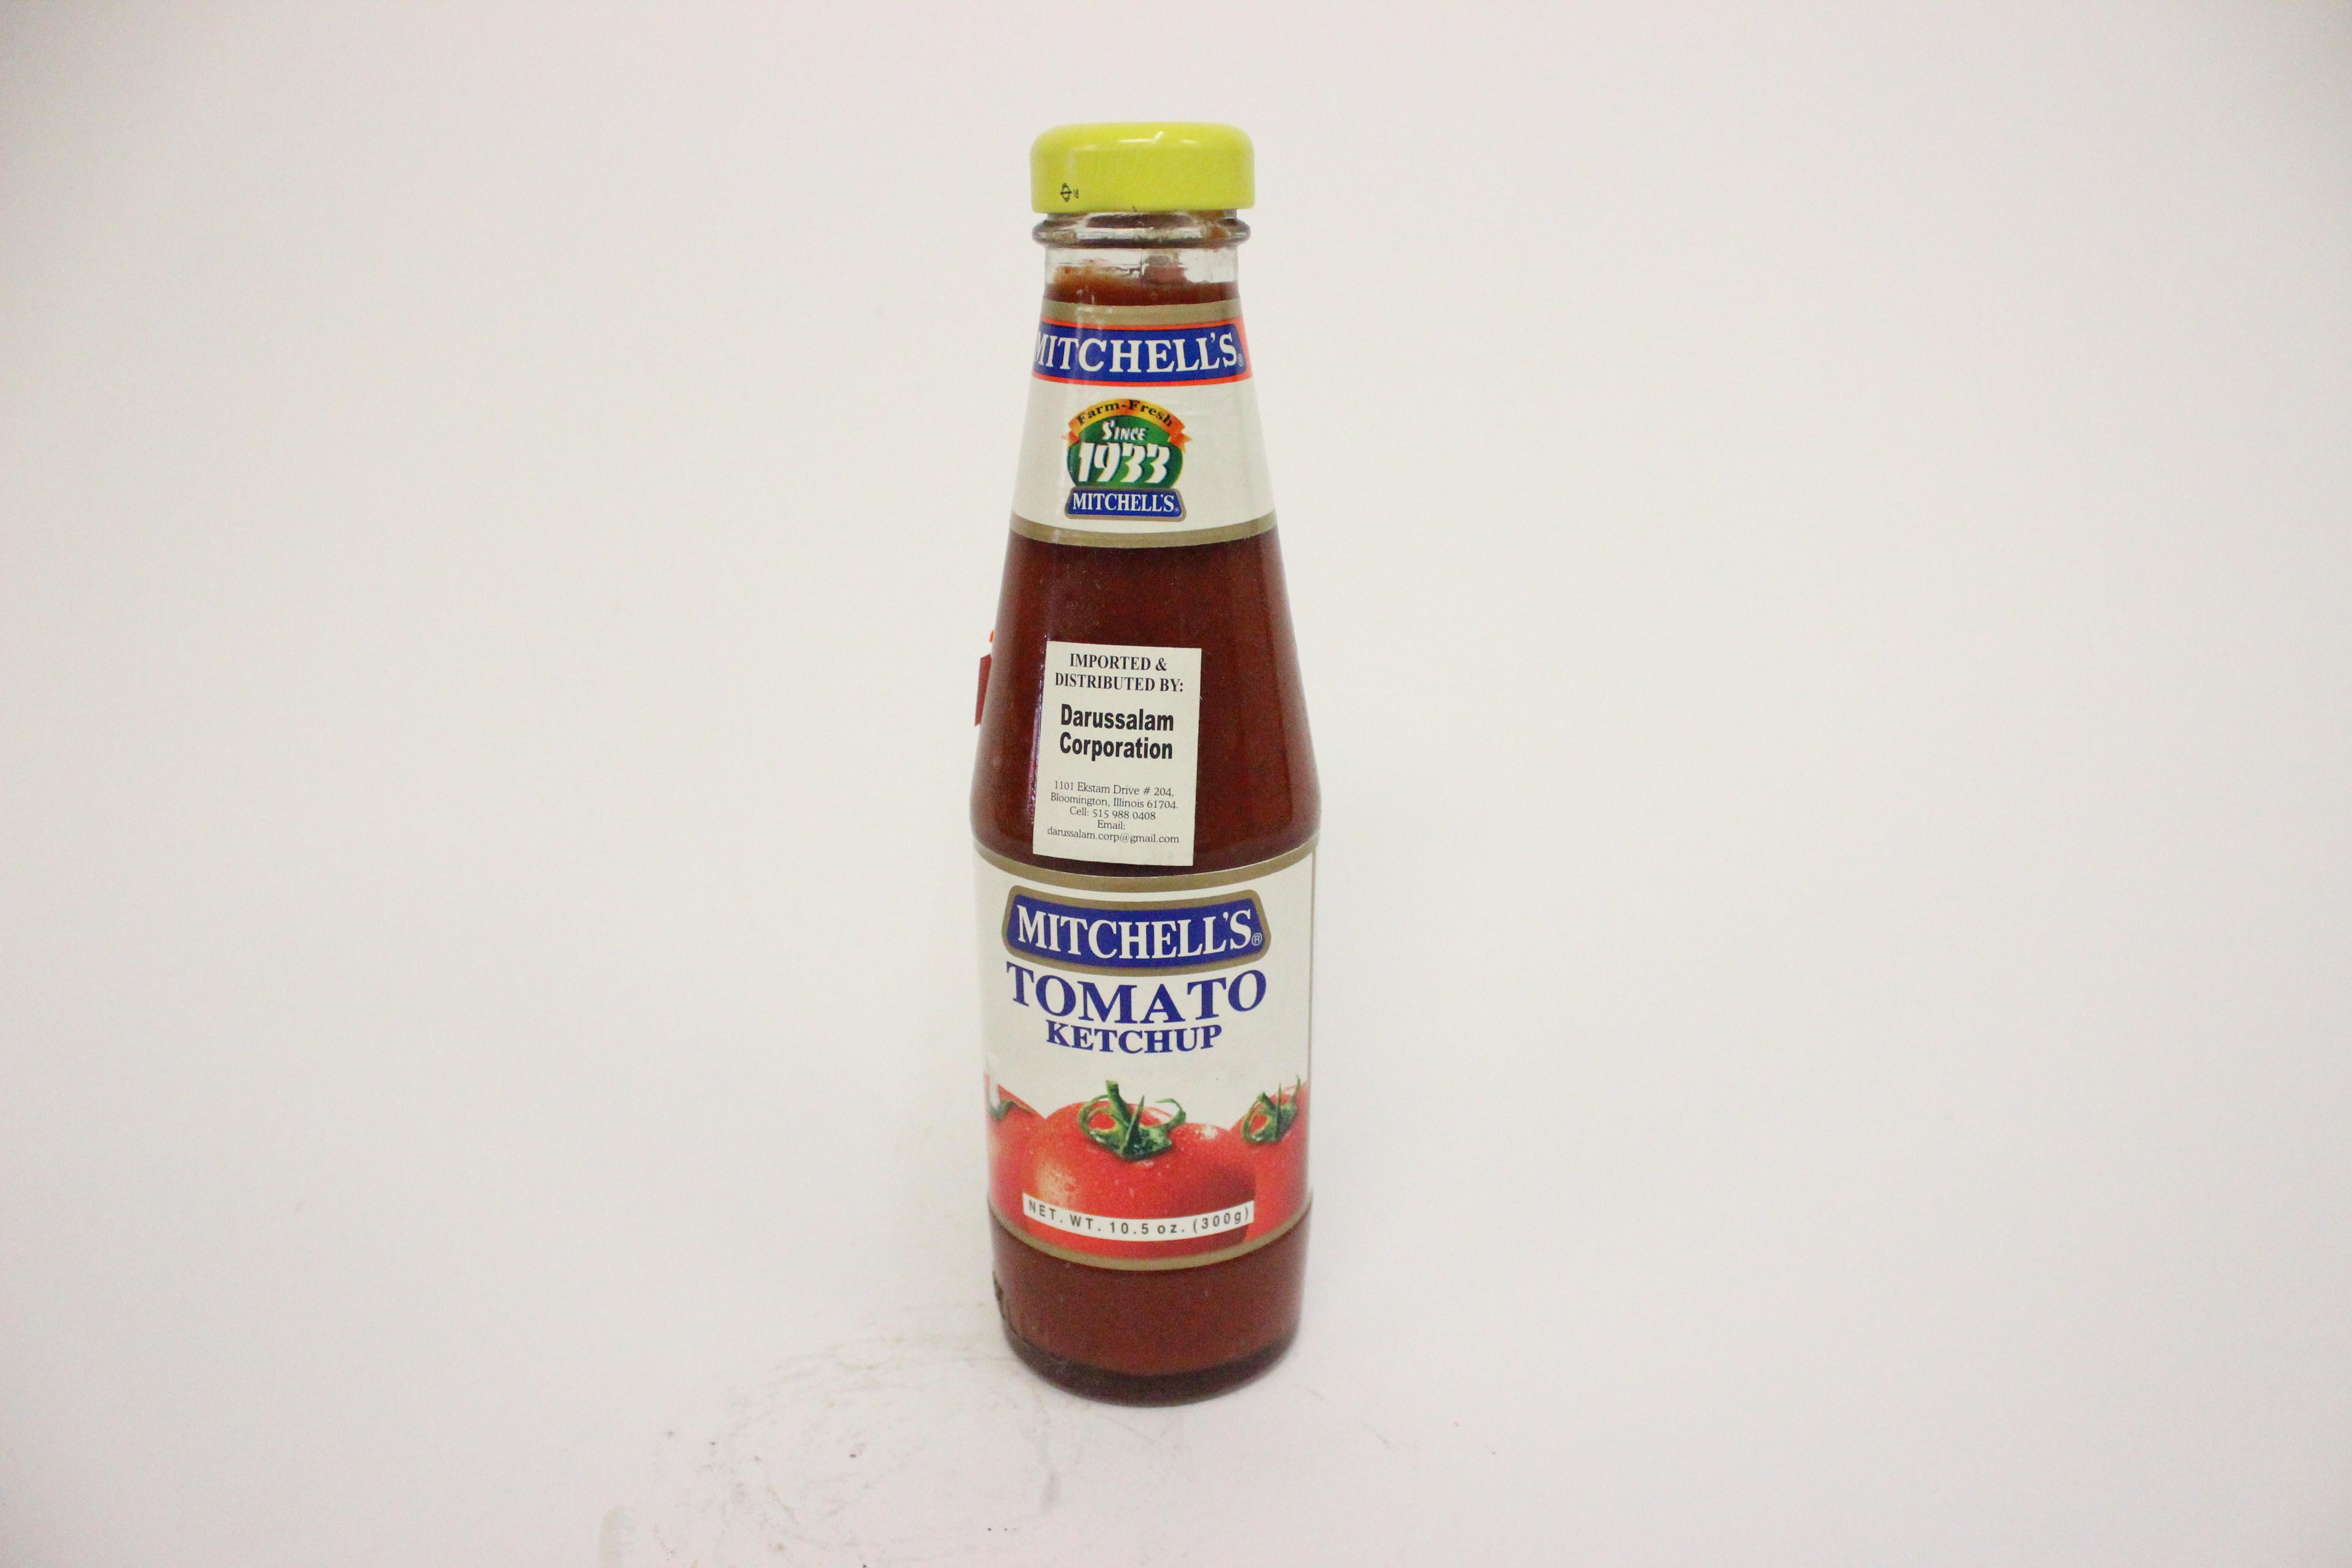 Mitchell's Tomato Ketchup 10.5 oz